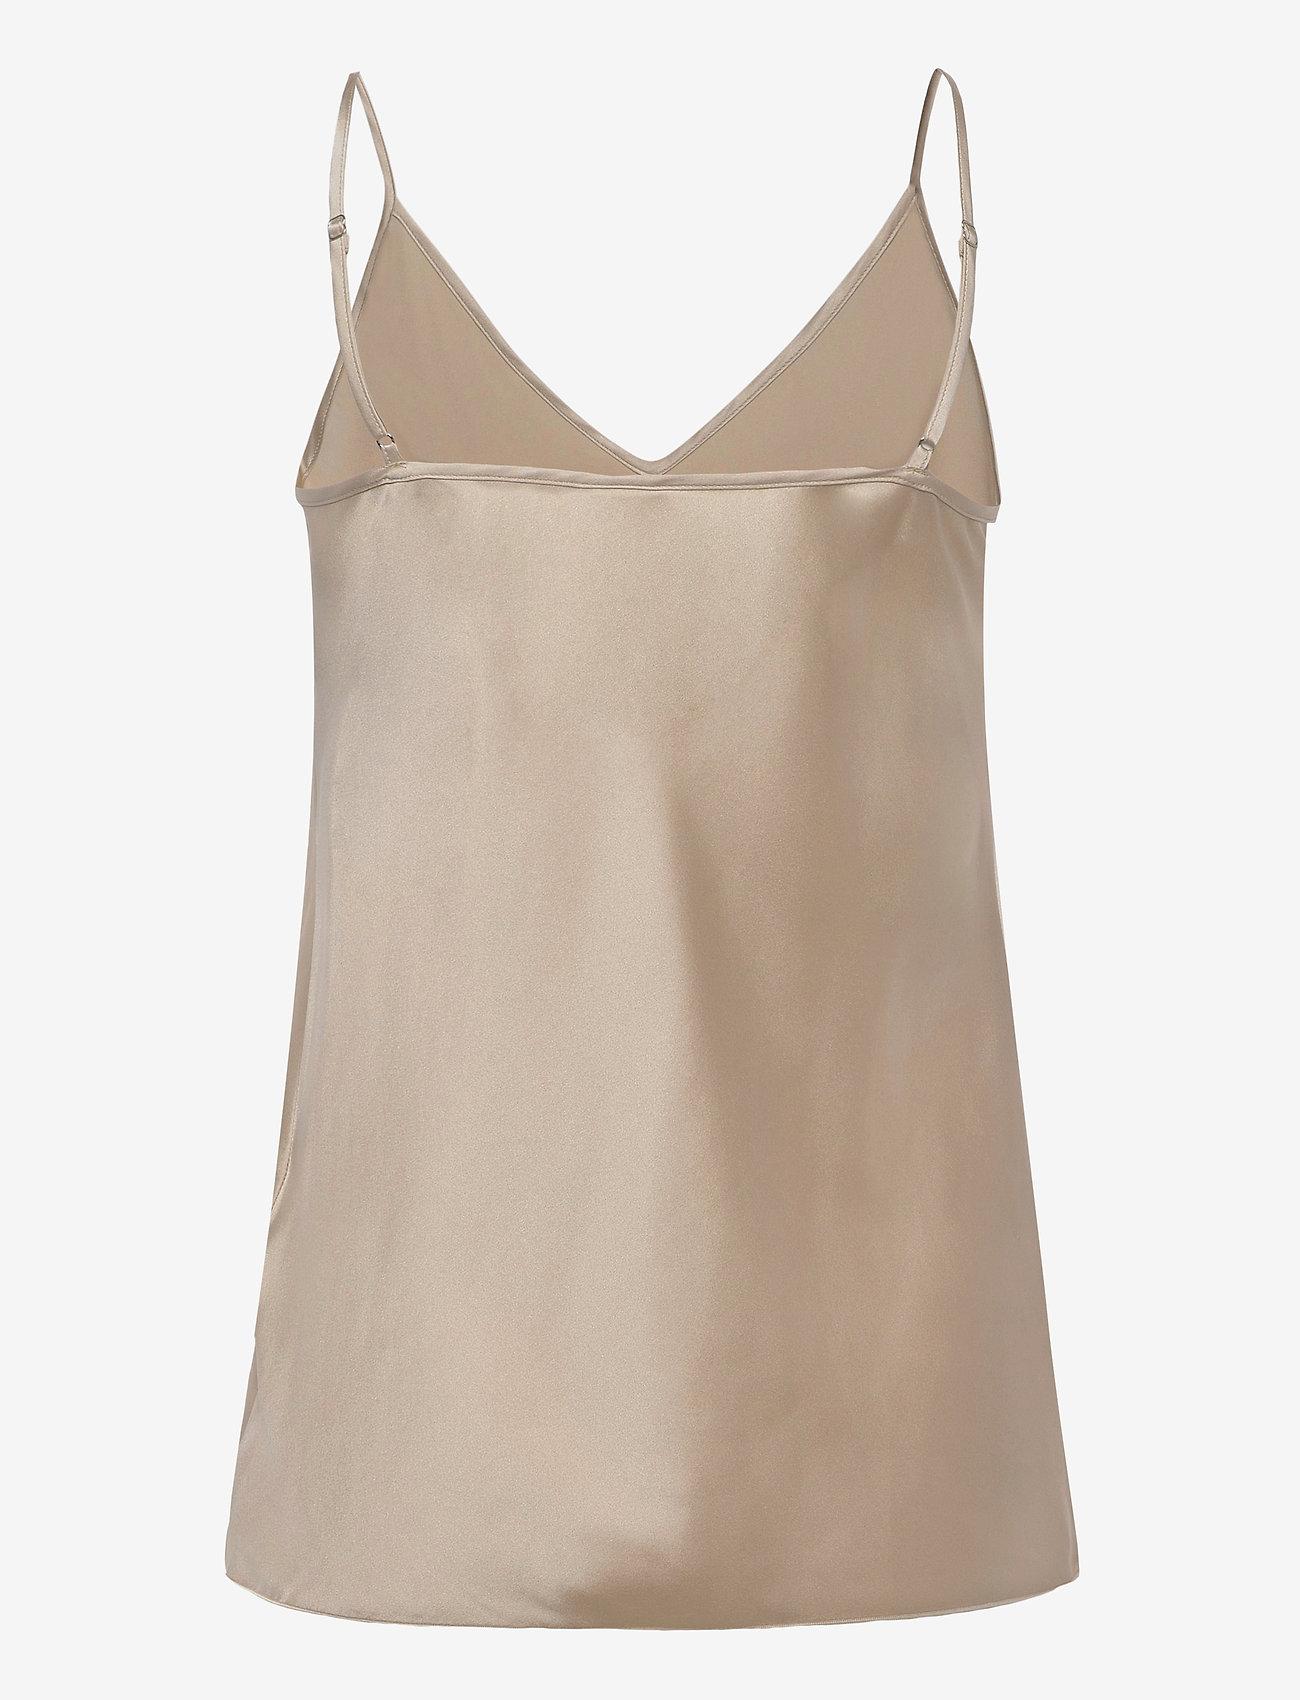 Max Mara Leisure - LUCCA - sleeveless blouses - ecru - 1